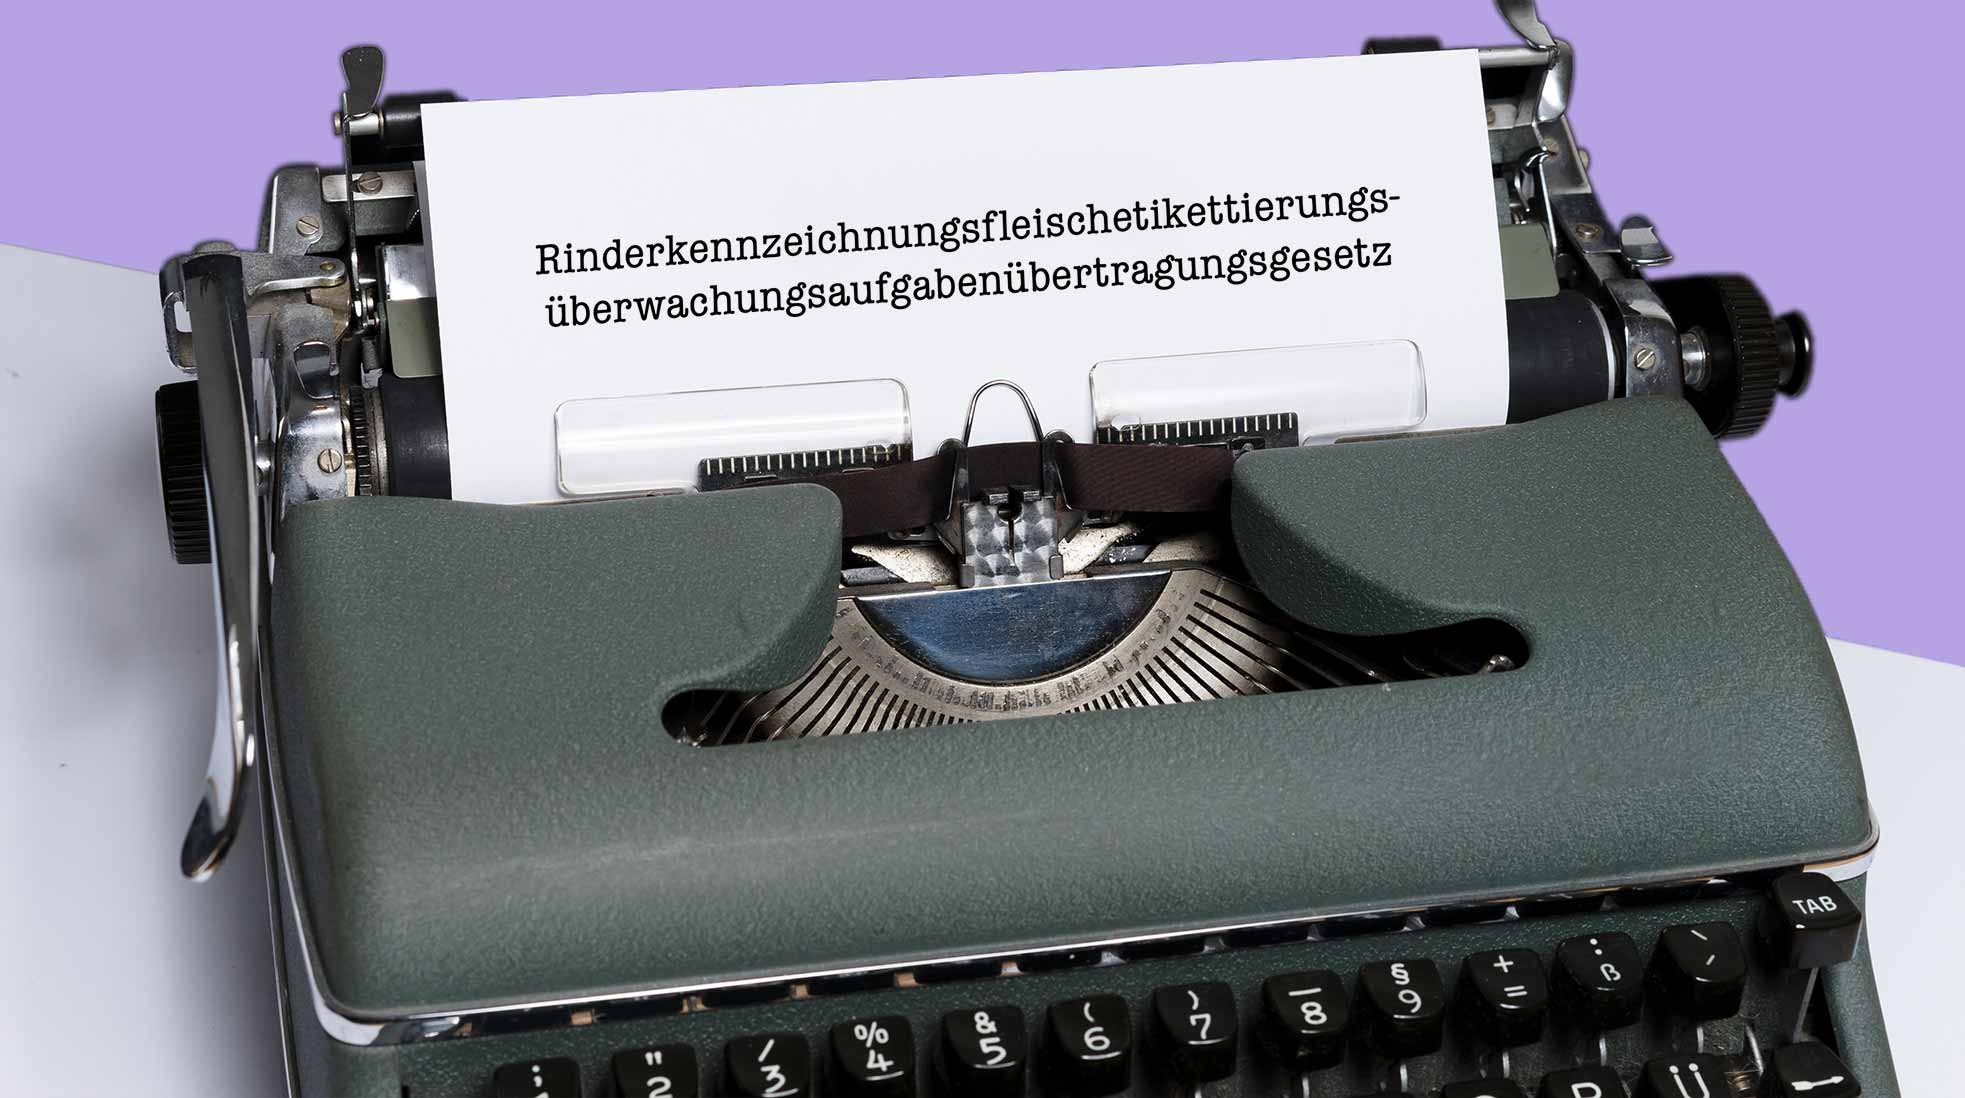 An old German typewriter. Photo:  Markus Winkler / Unsplash (image has been modified).